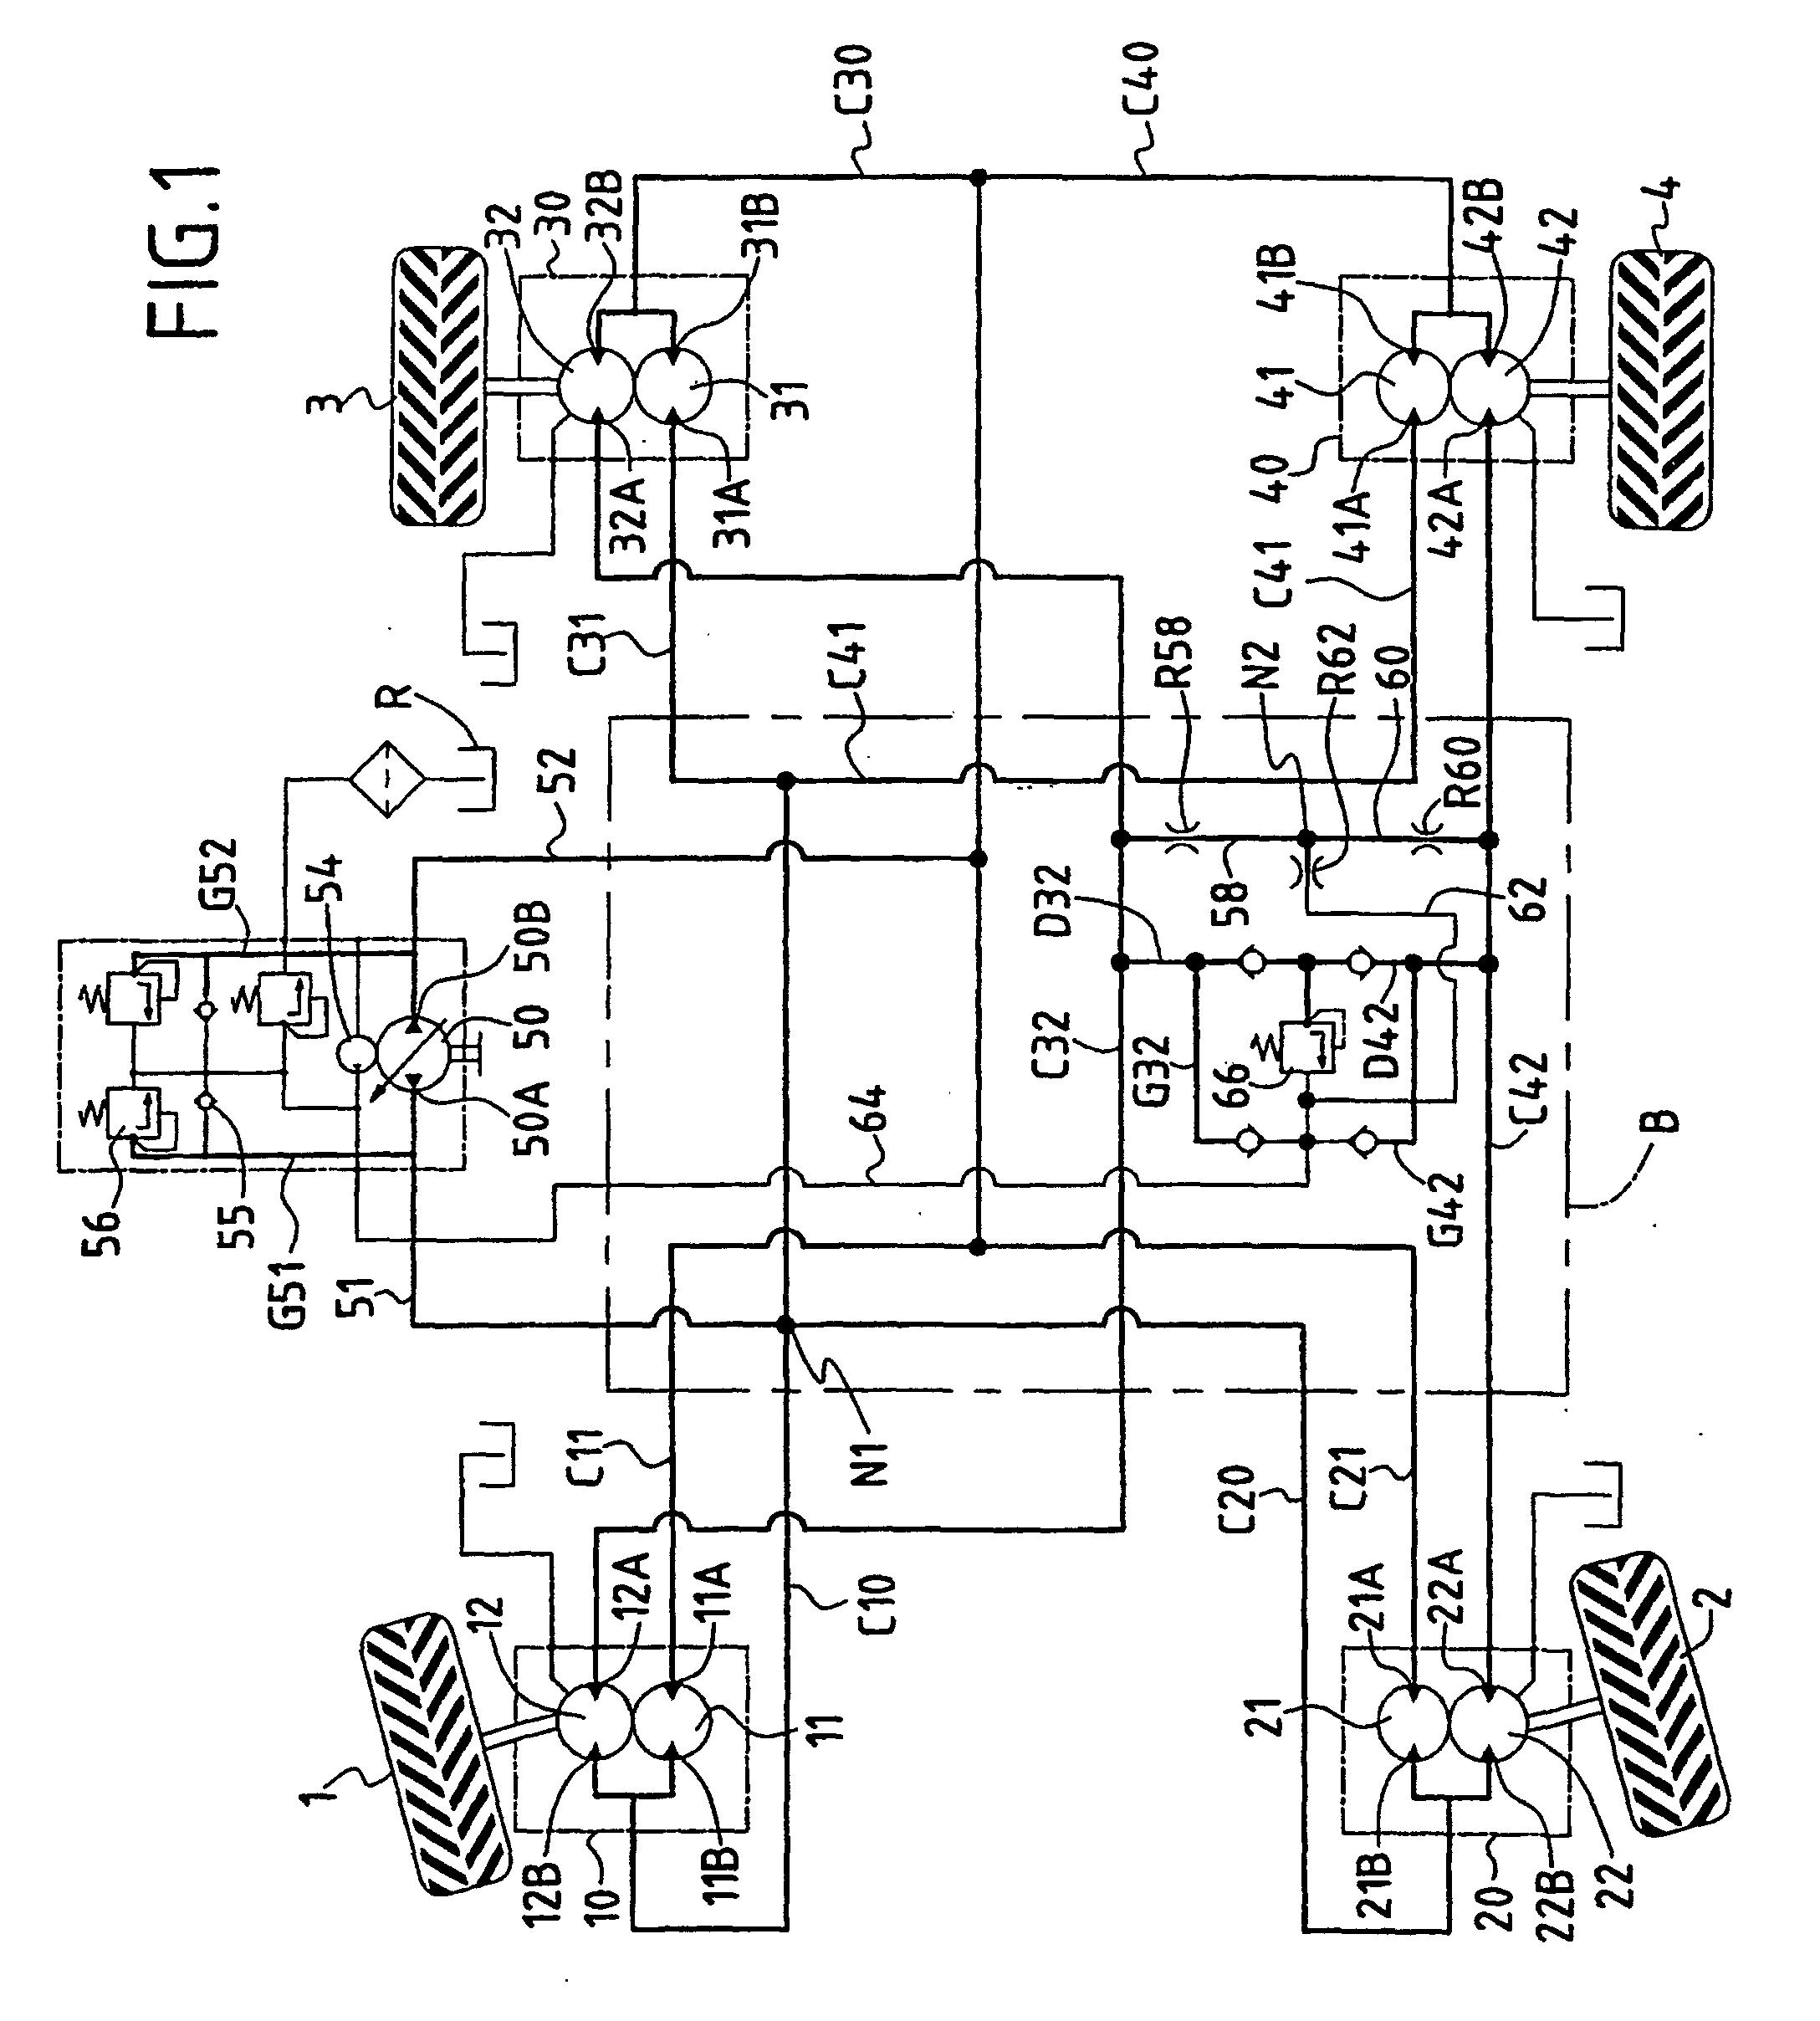 patent ep1420973b1